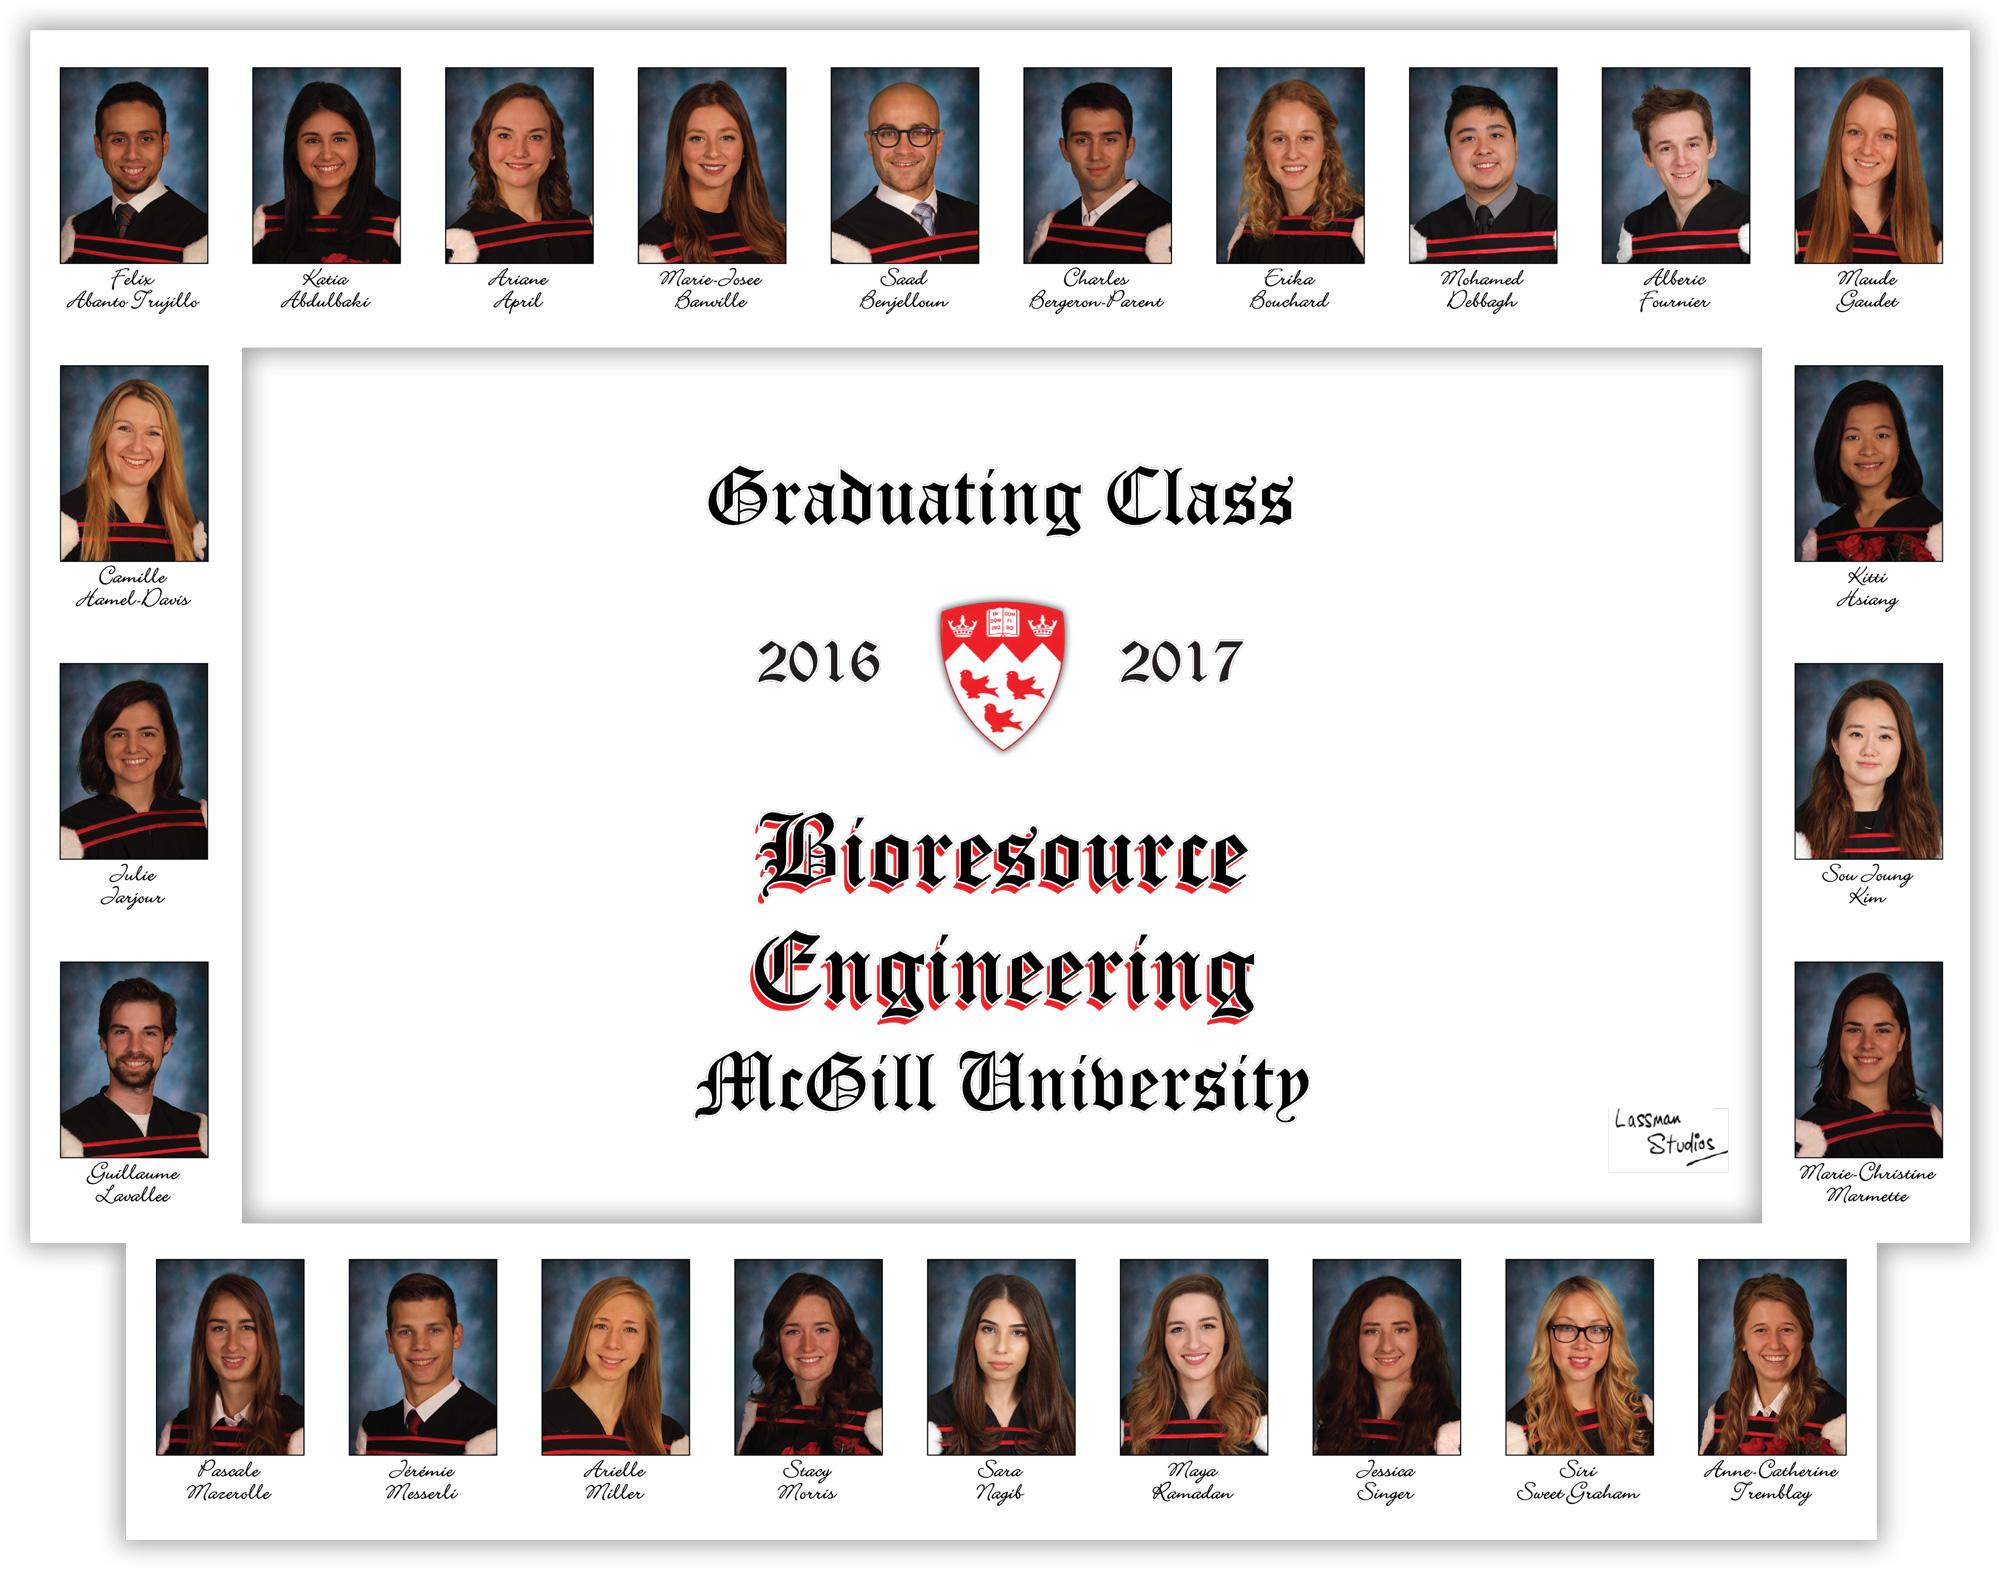 Mosaics-2017-Bioresource-Engineering